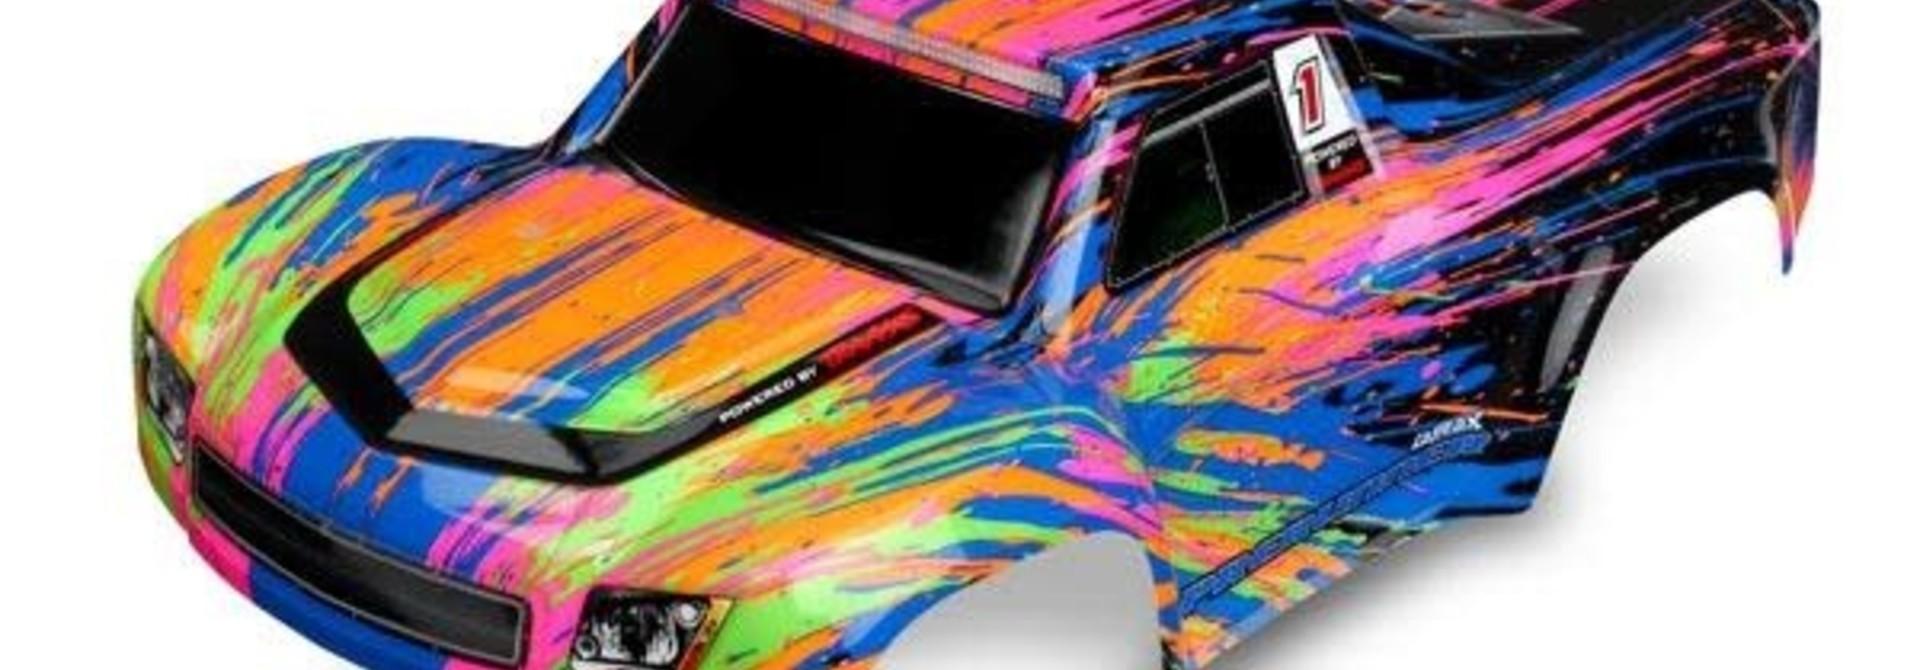 Body, LaTrax Desert PreRunner, color burst (painted)/ decals